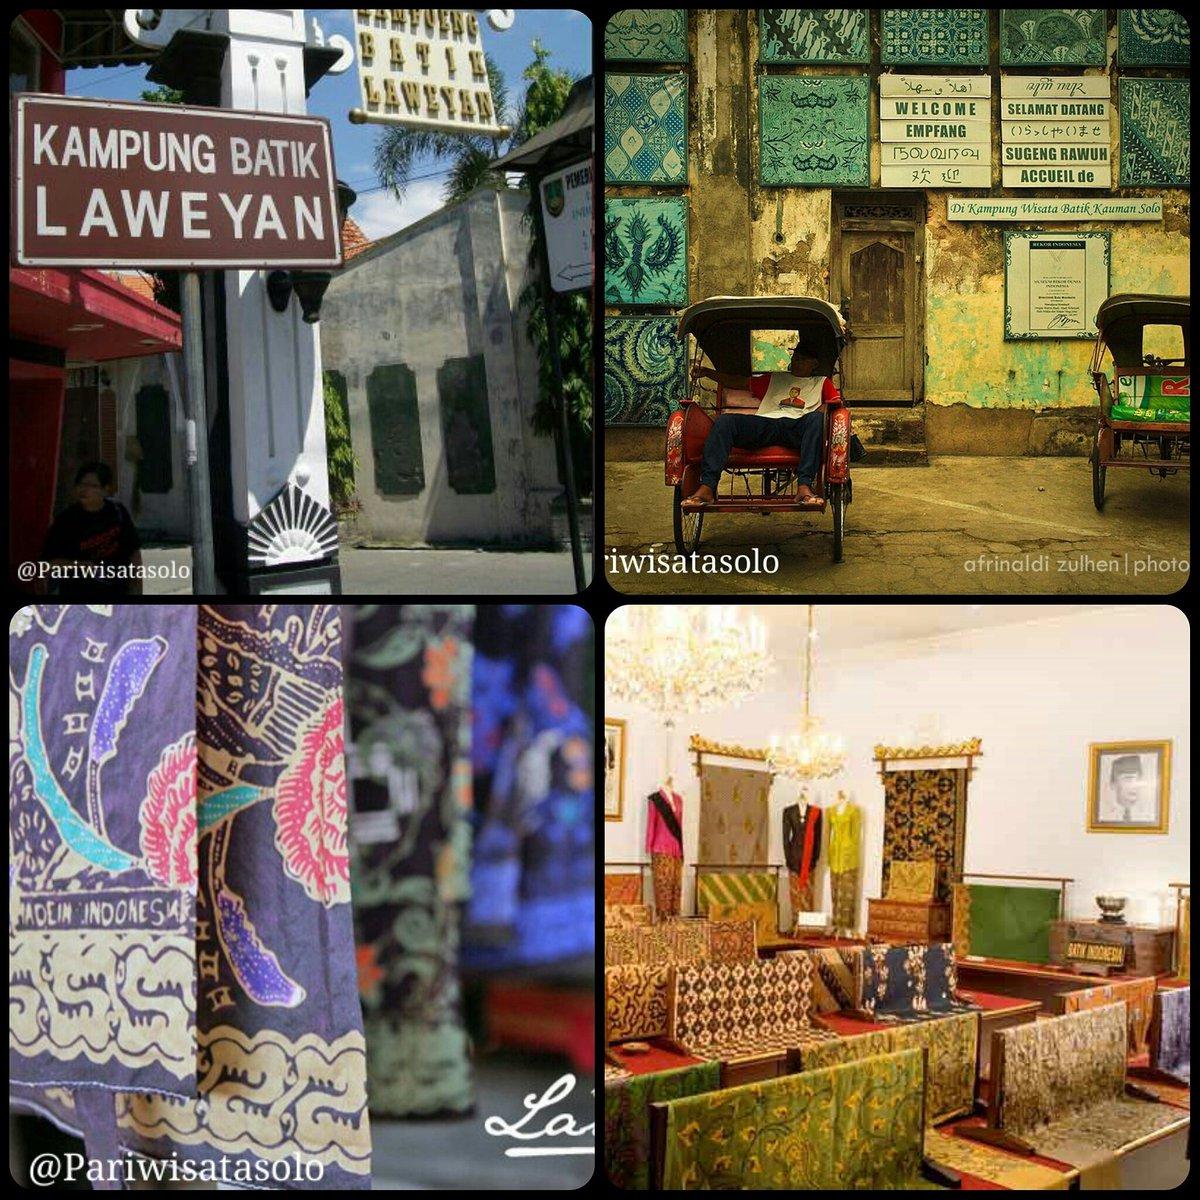 Wisata Solo در توییتر Kampung Batik Laweyan Adalah Kawasan Sentra Batik Di Kota Solo Yang Sudah Ada Sejak Zaman Tahun 1546 Https T Co T1bpwxkjxa